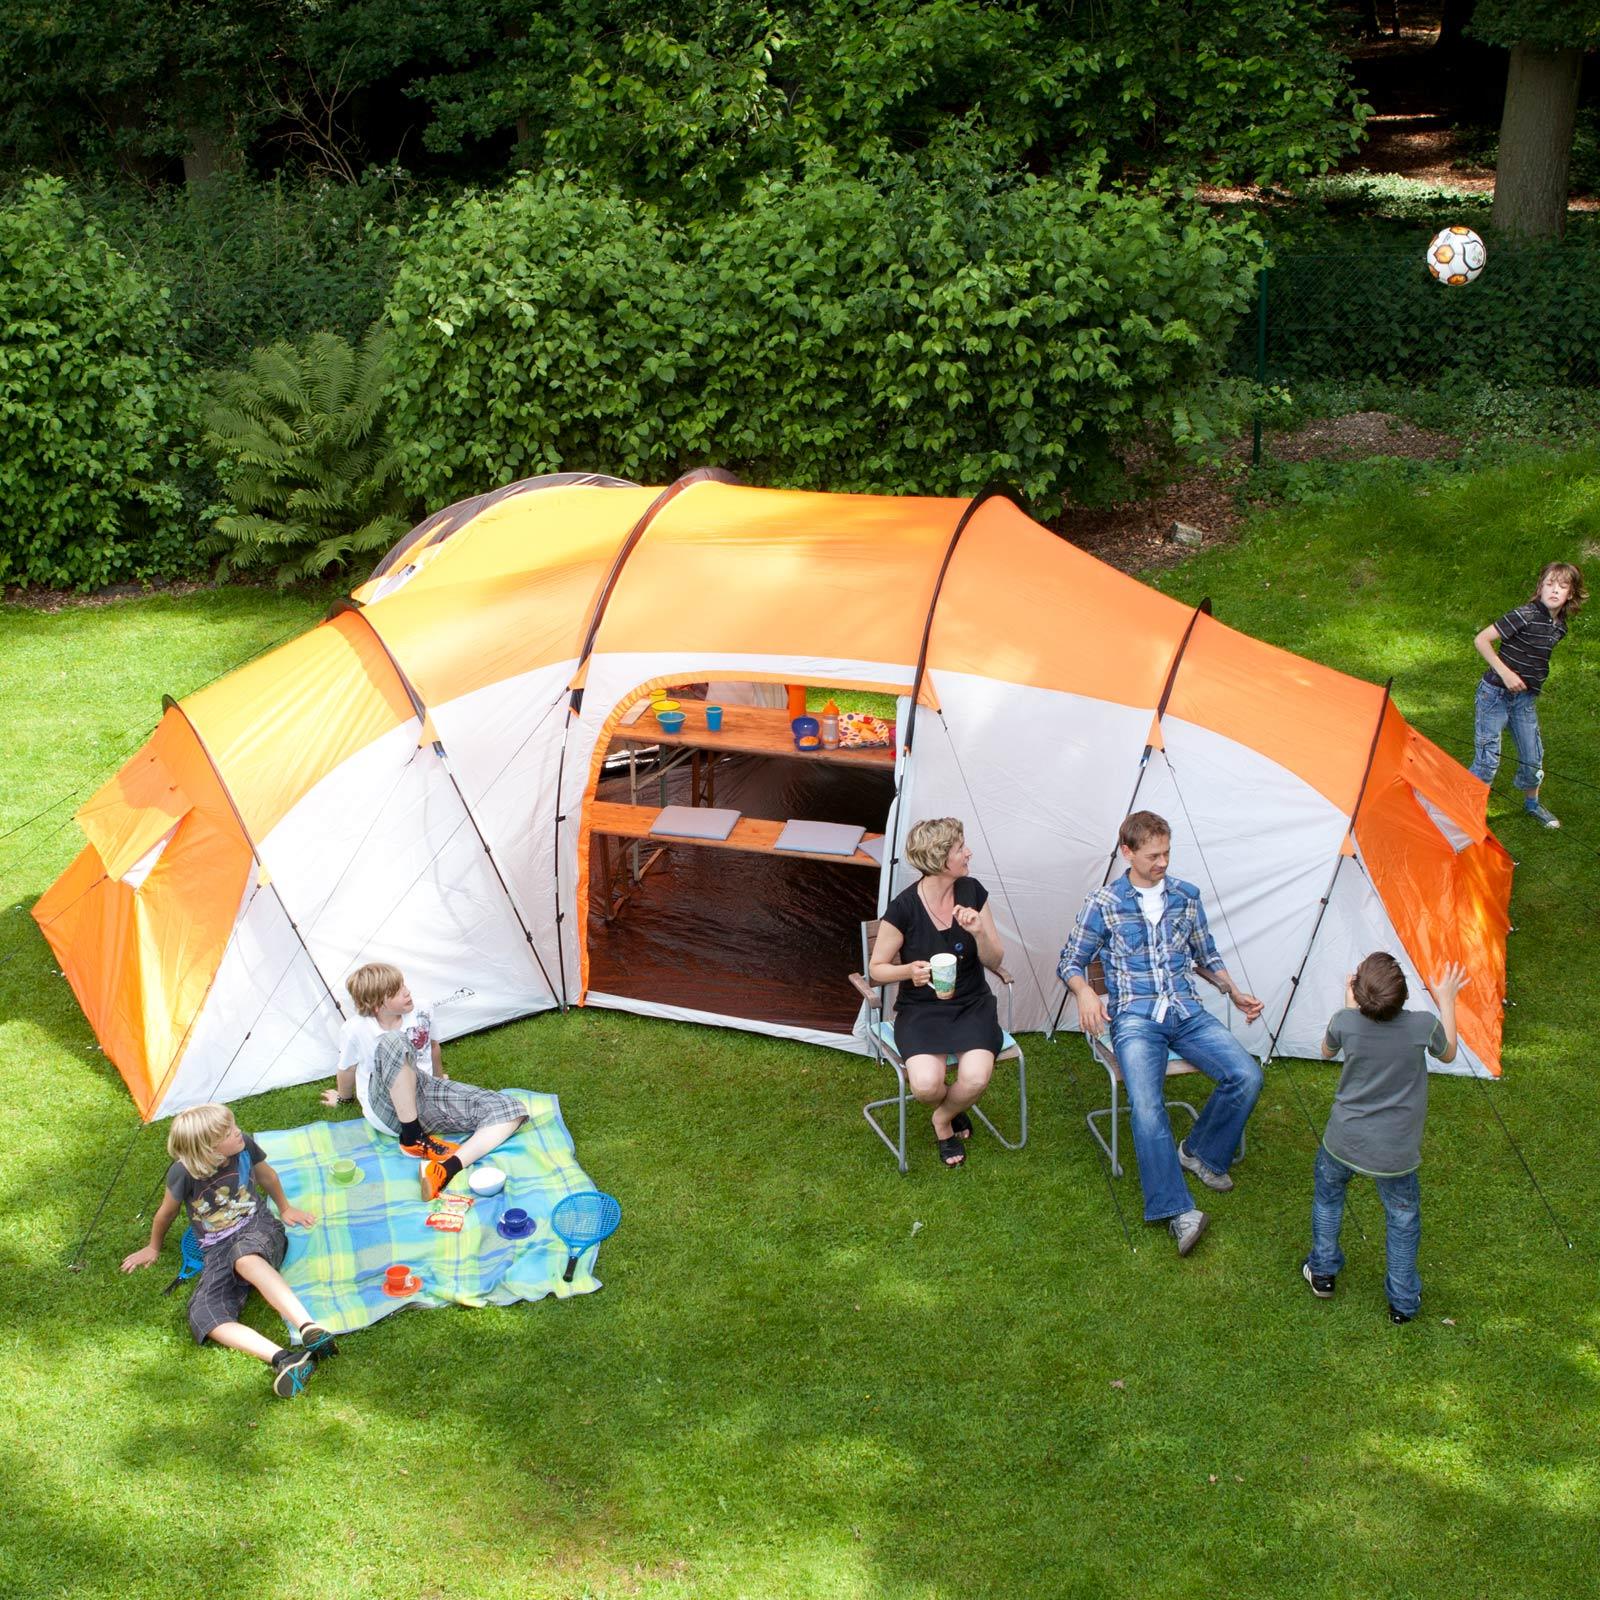 Zelt 9 Personen : Skandika lausanne familienzelt personen camping zelt